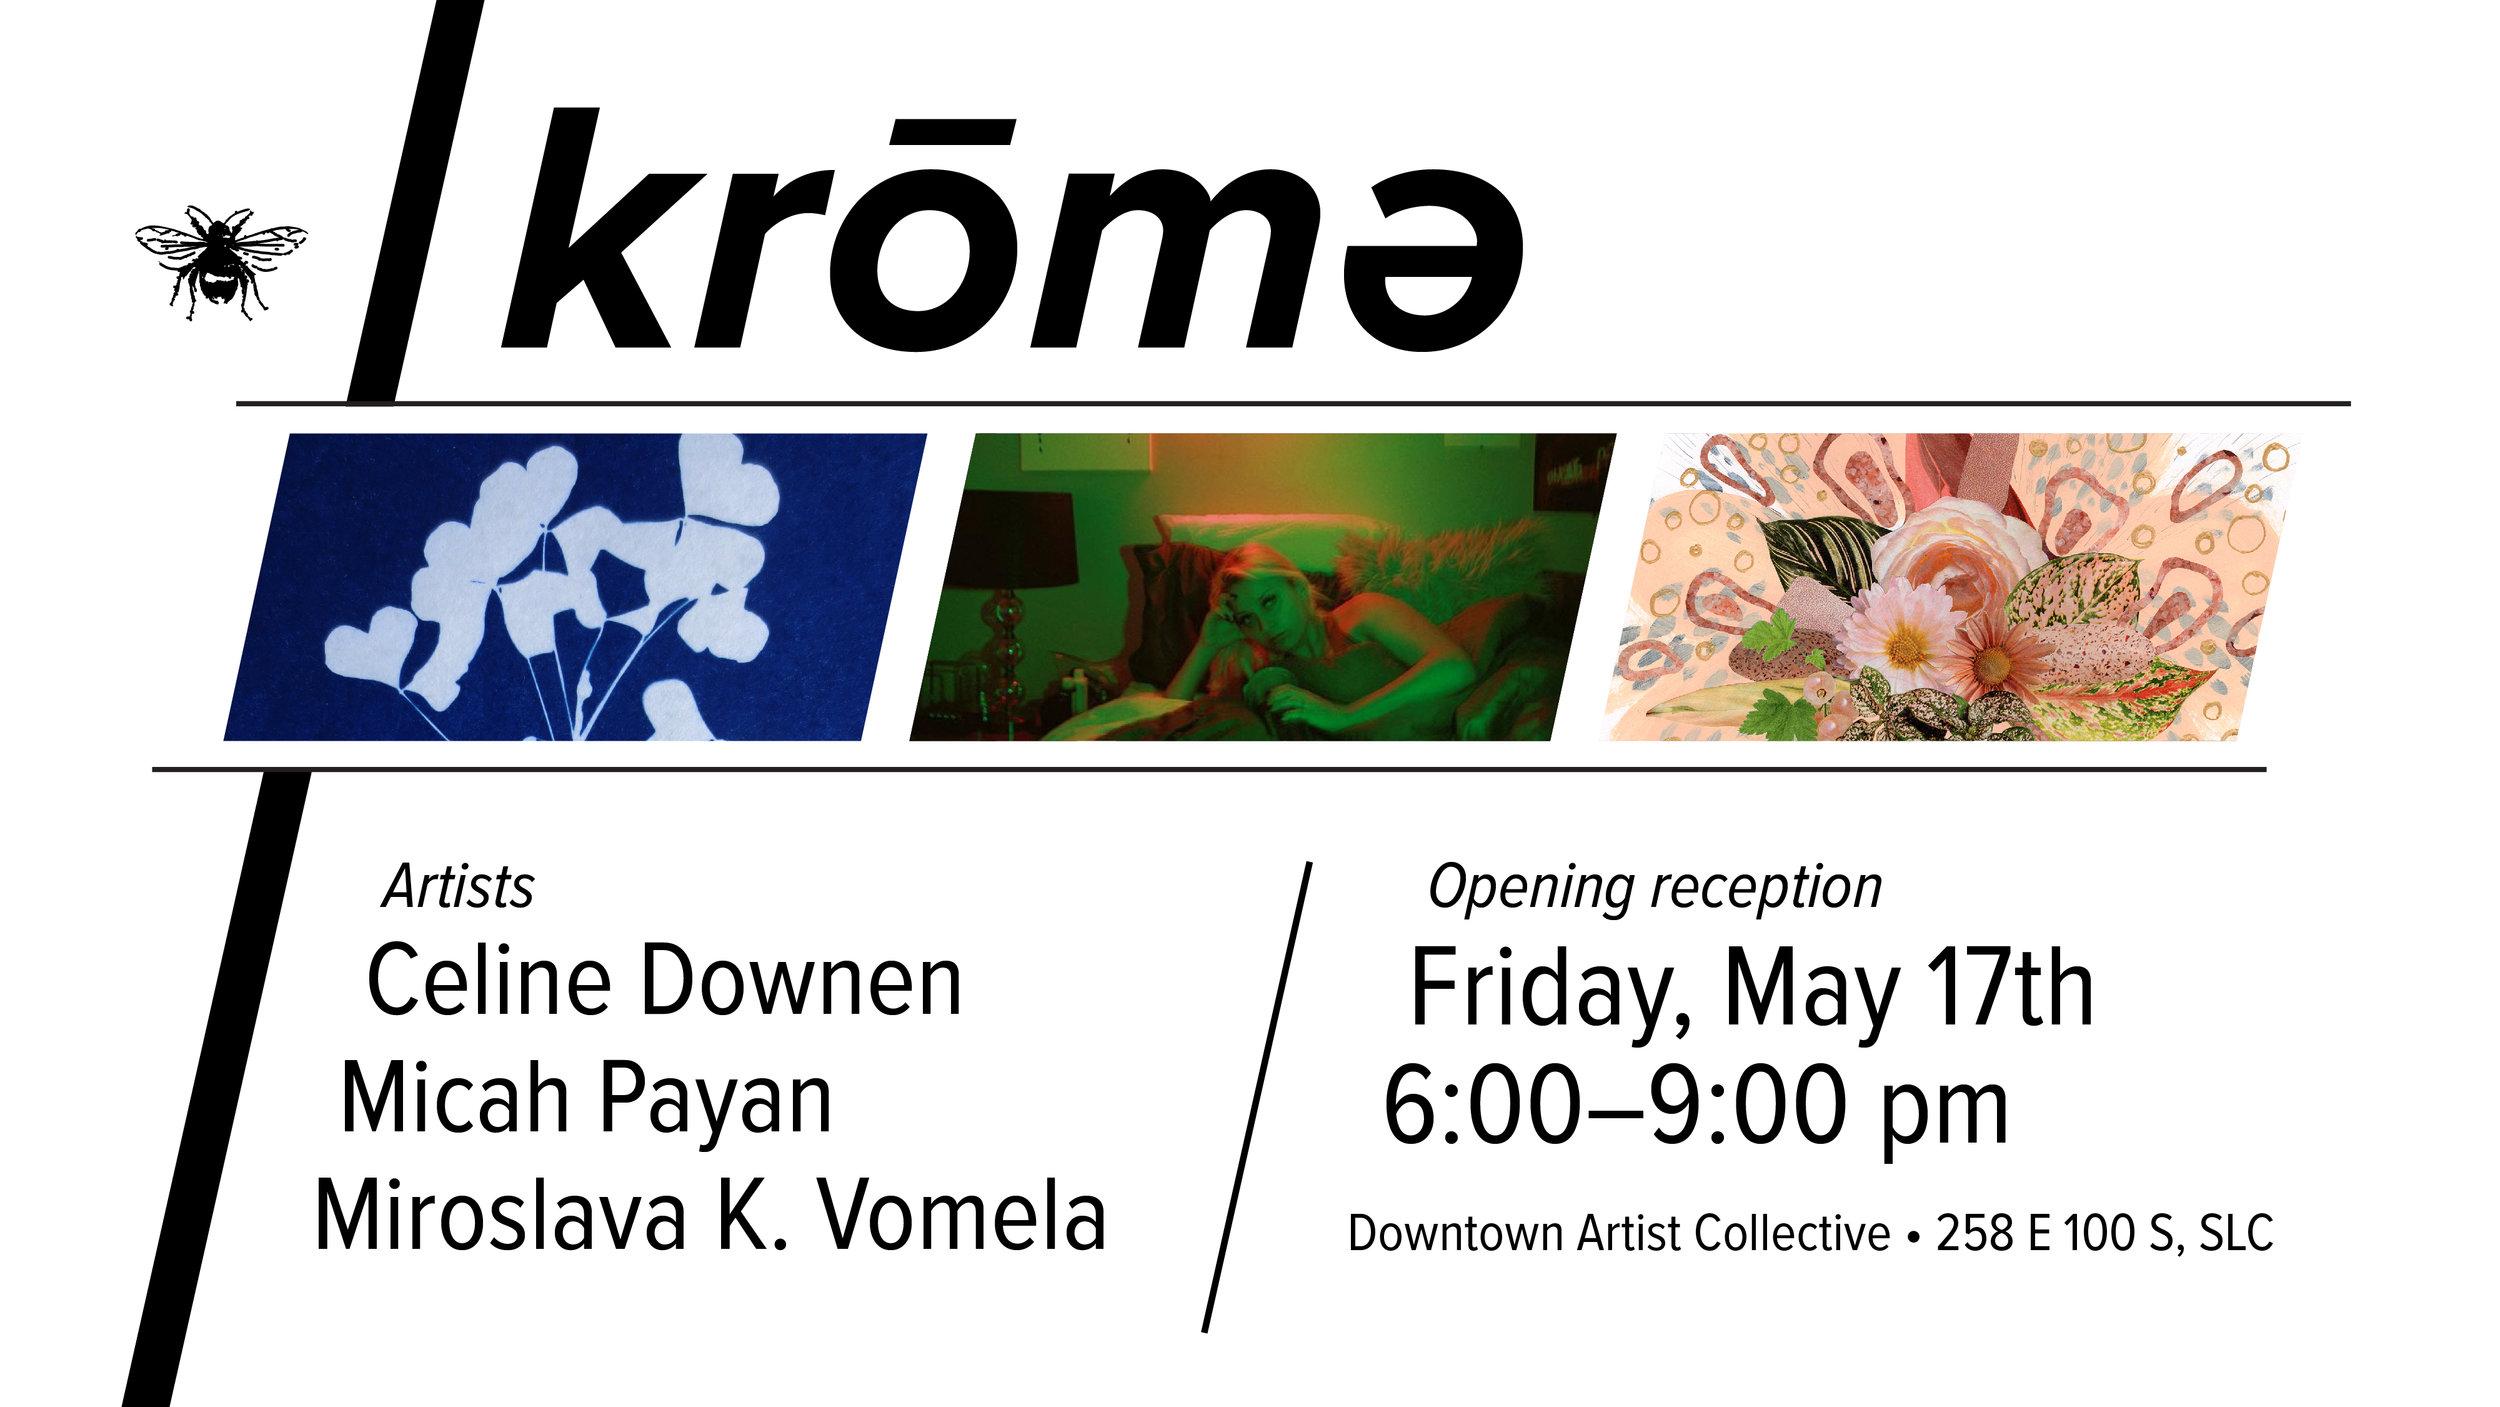 krome-facebook-event.jpg